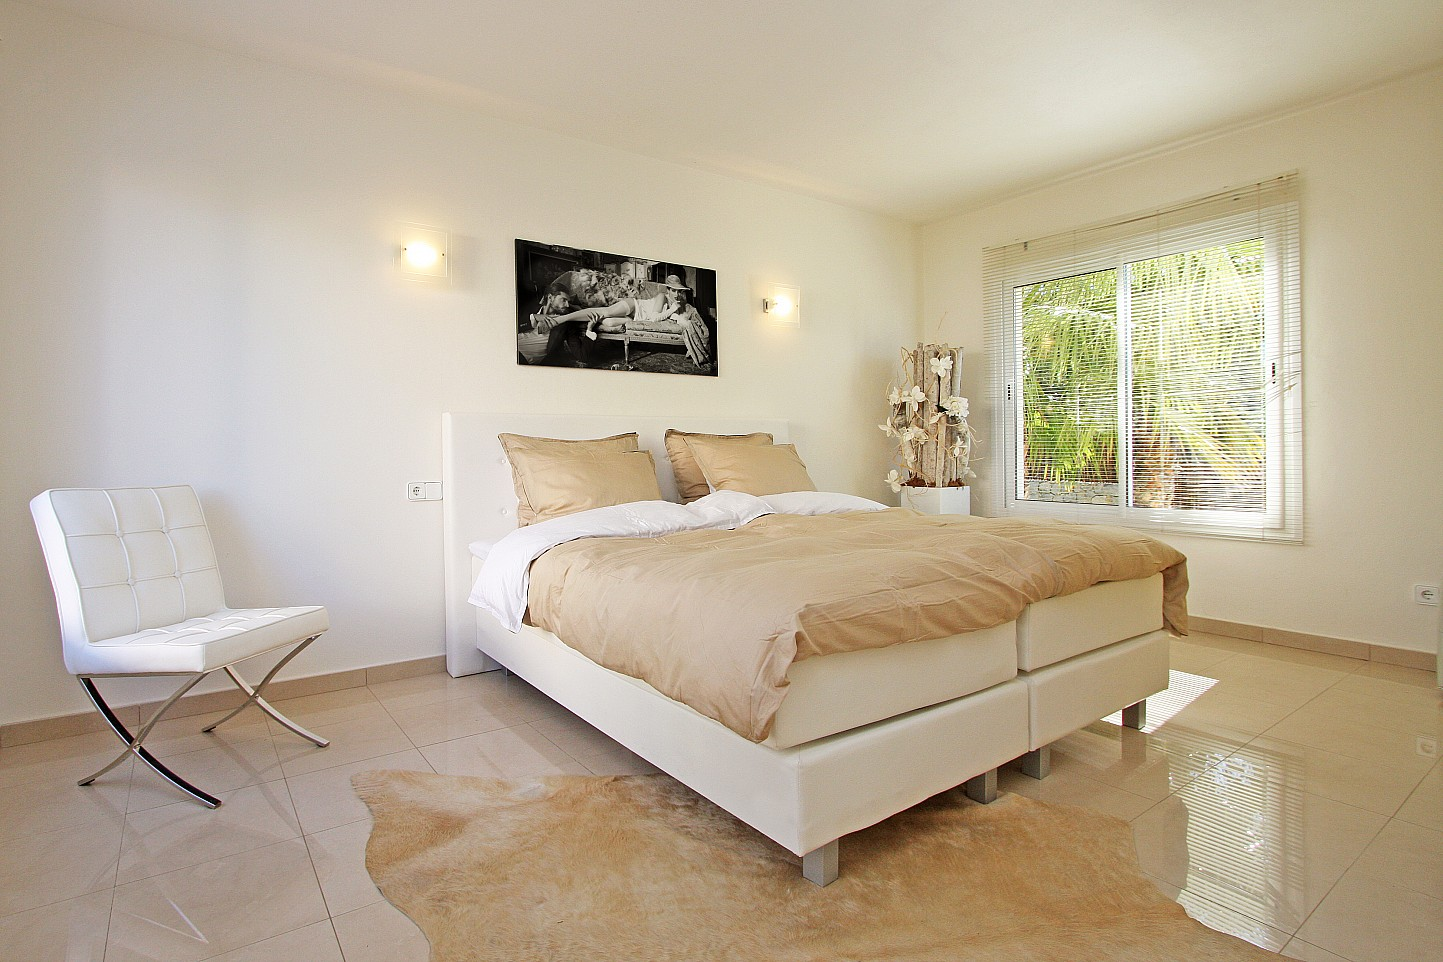 Уютная бежево-белая спальня